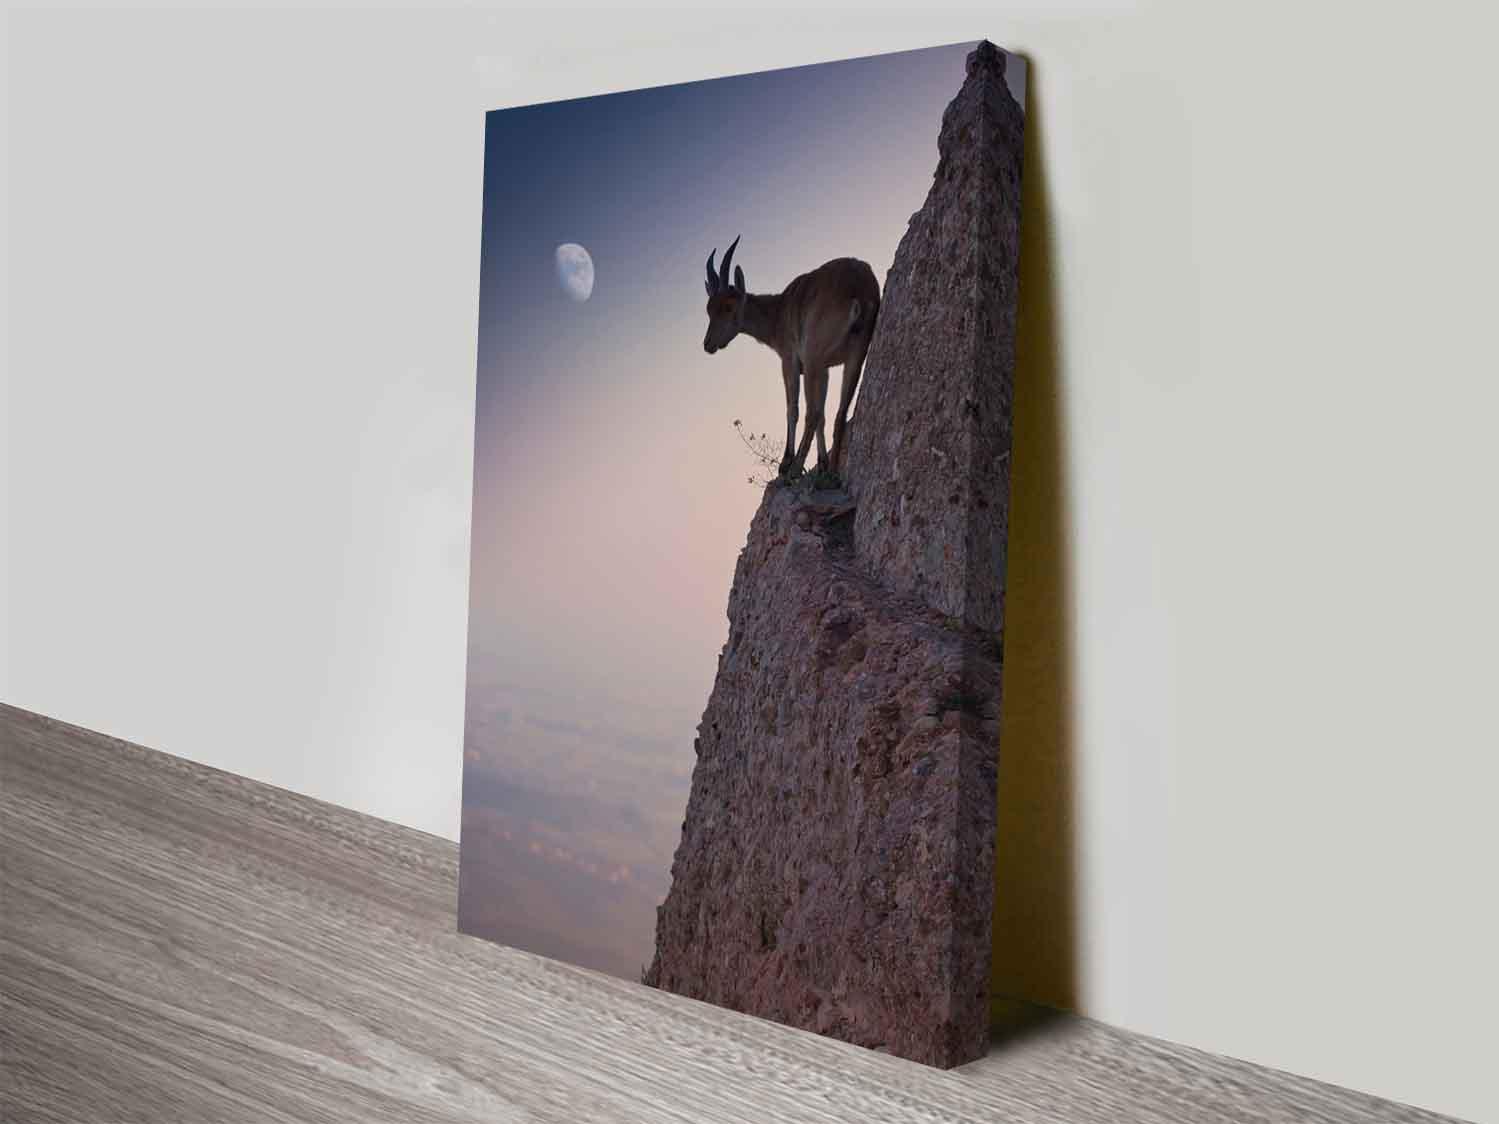 Mountain goat discount photo art into canvas prints for sale for Cheap canvas prints for sale